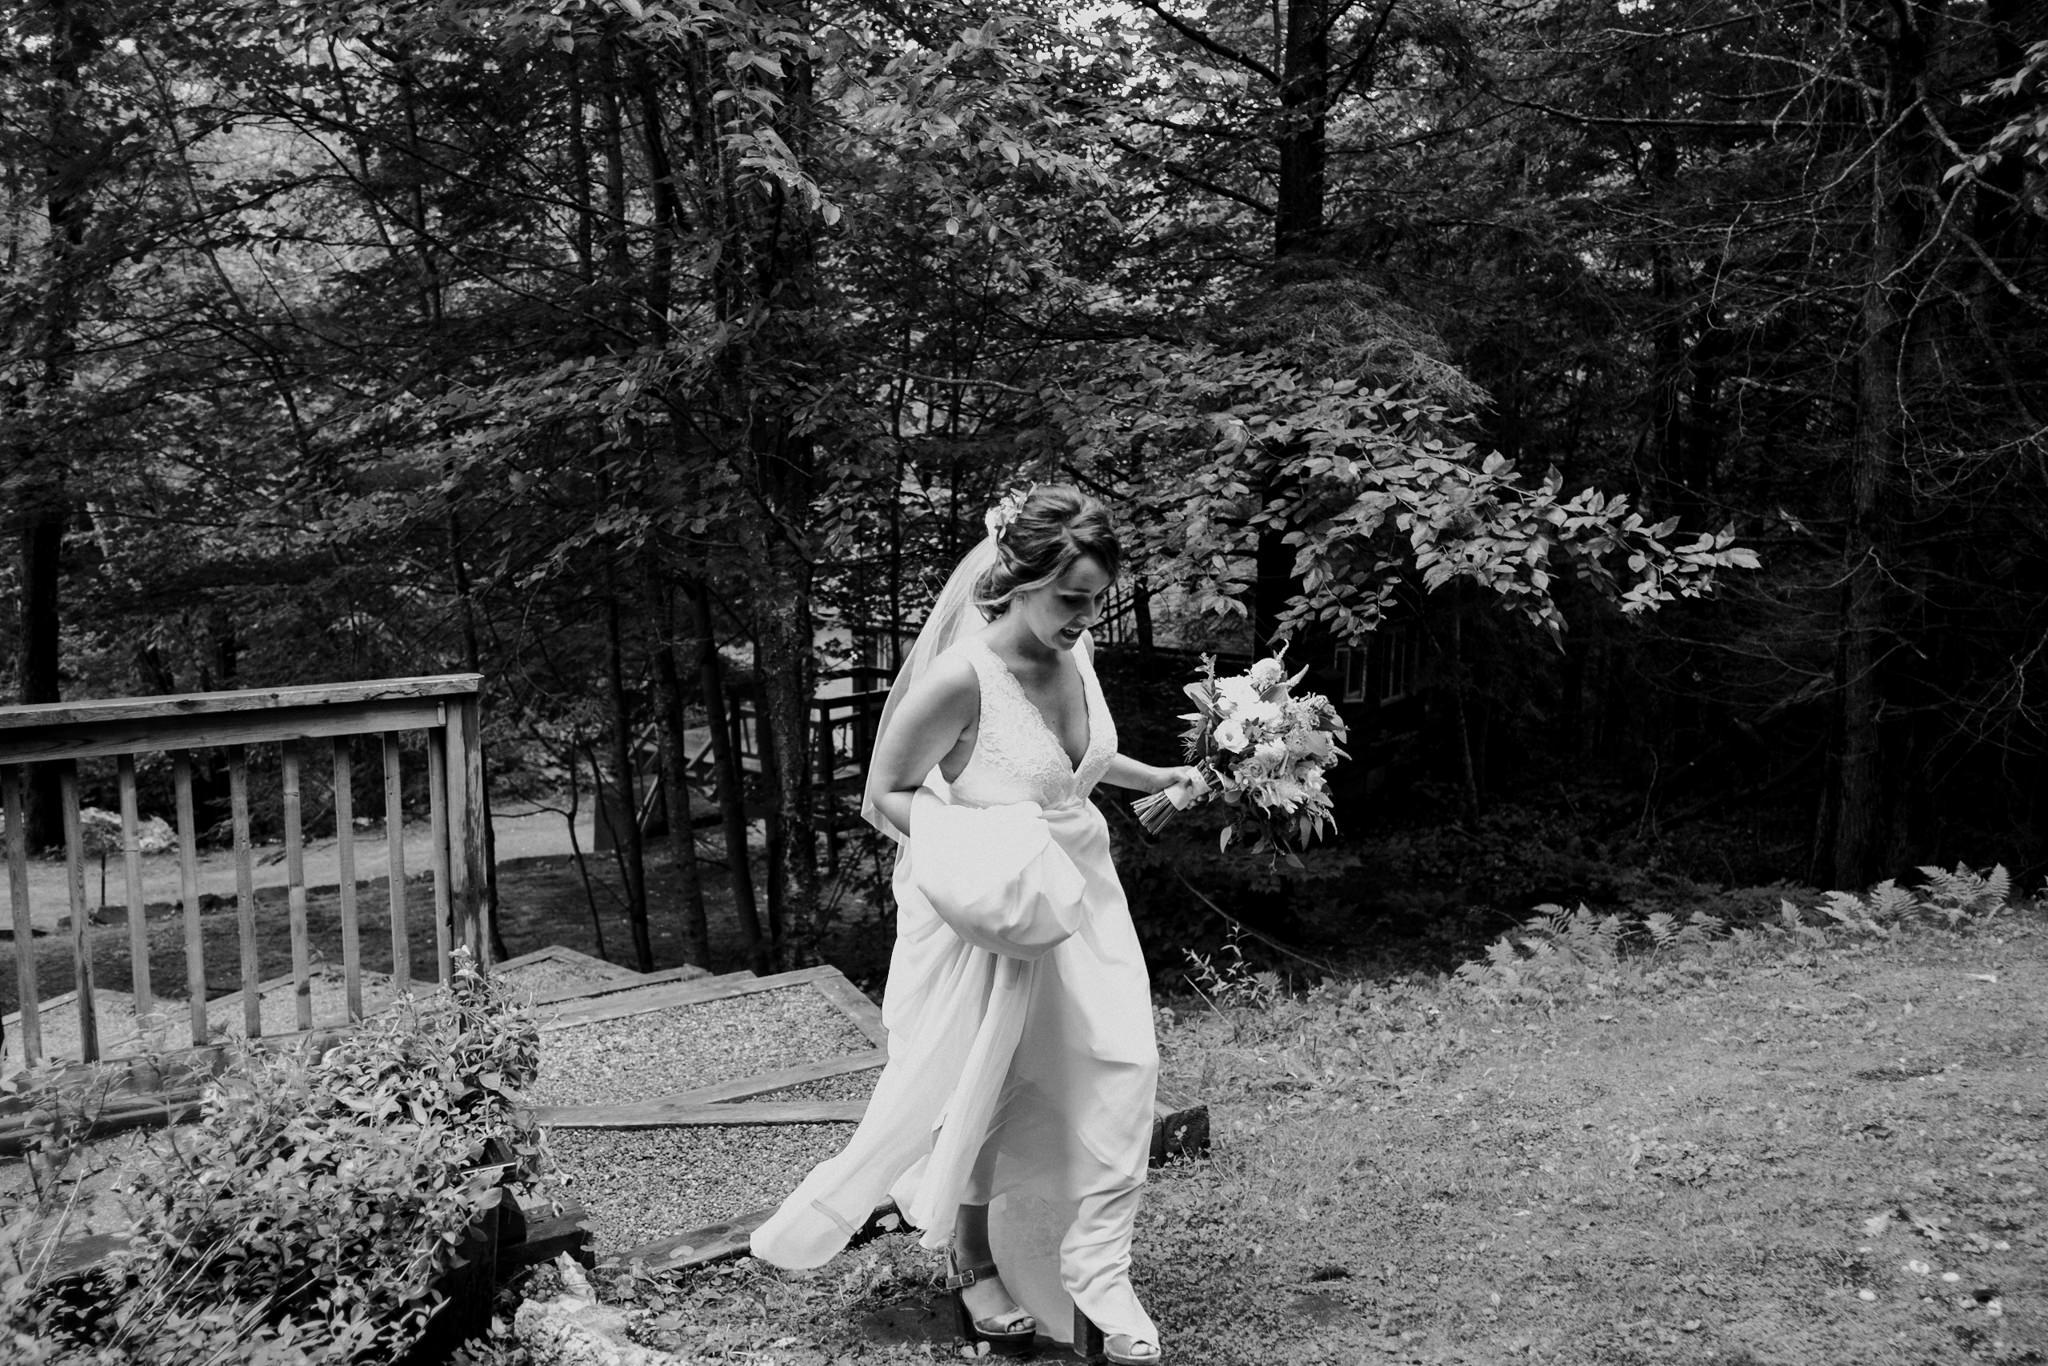 Trillium Resort Muskoka Wedding Photographer, Toronto Wedding Photographer, Cottage Wedding, first look